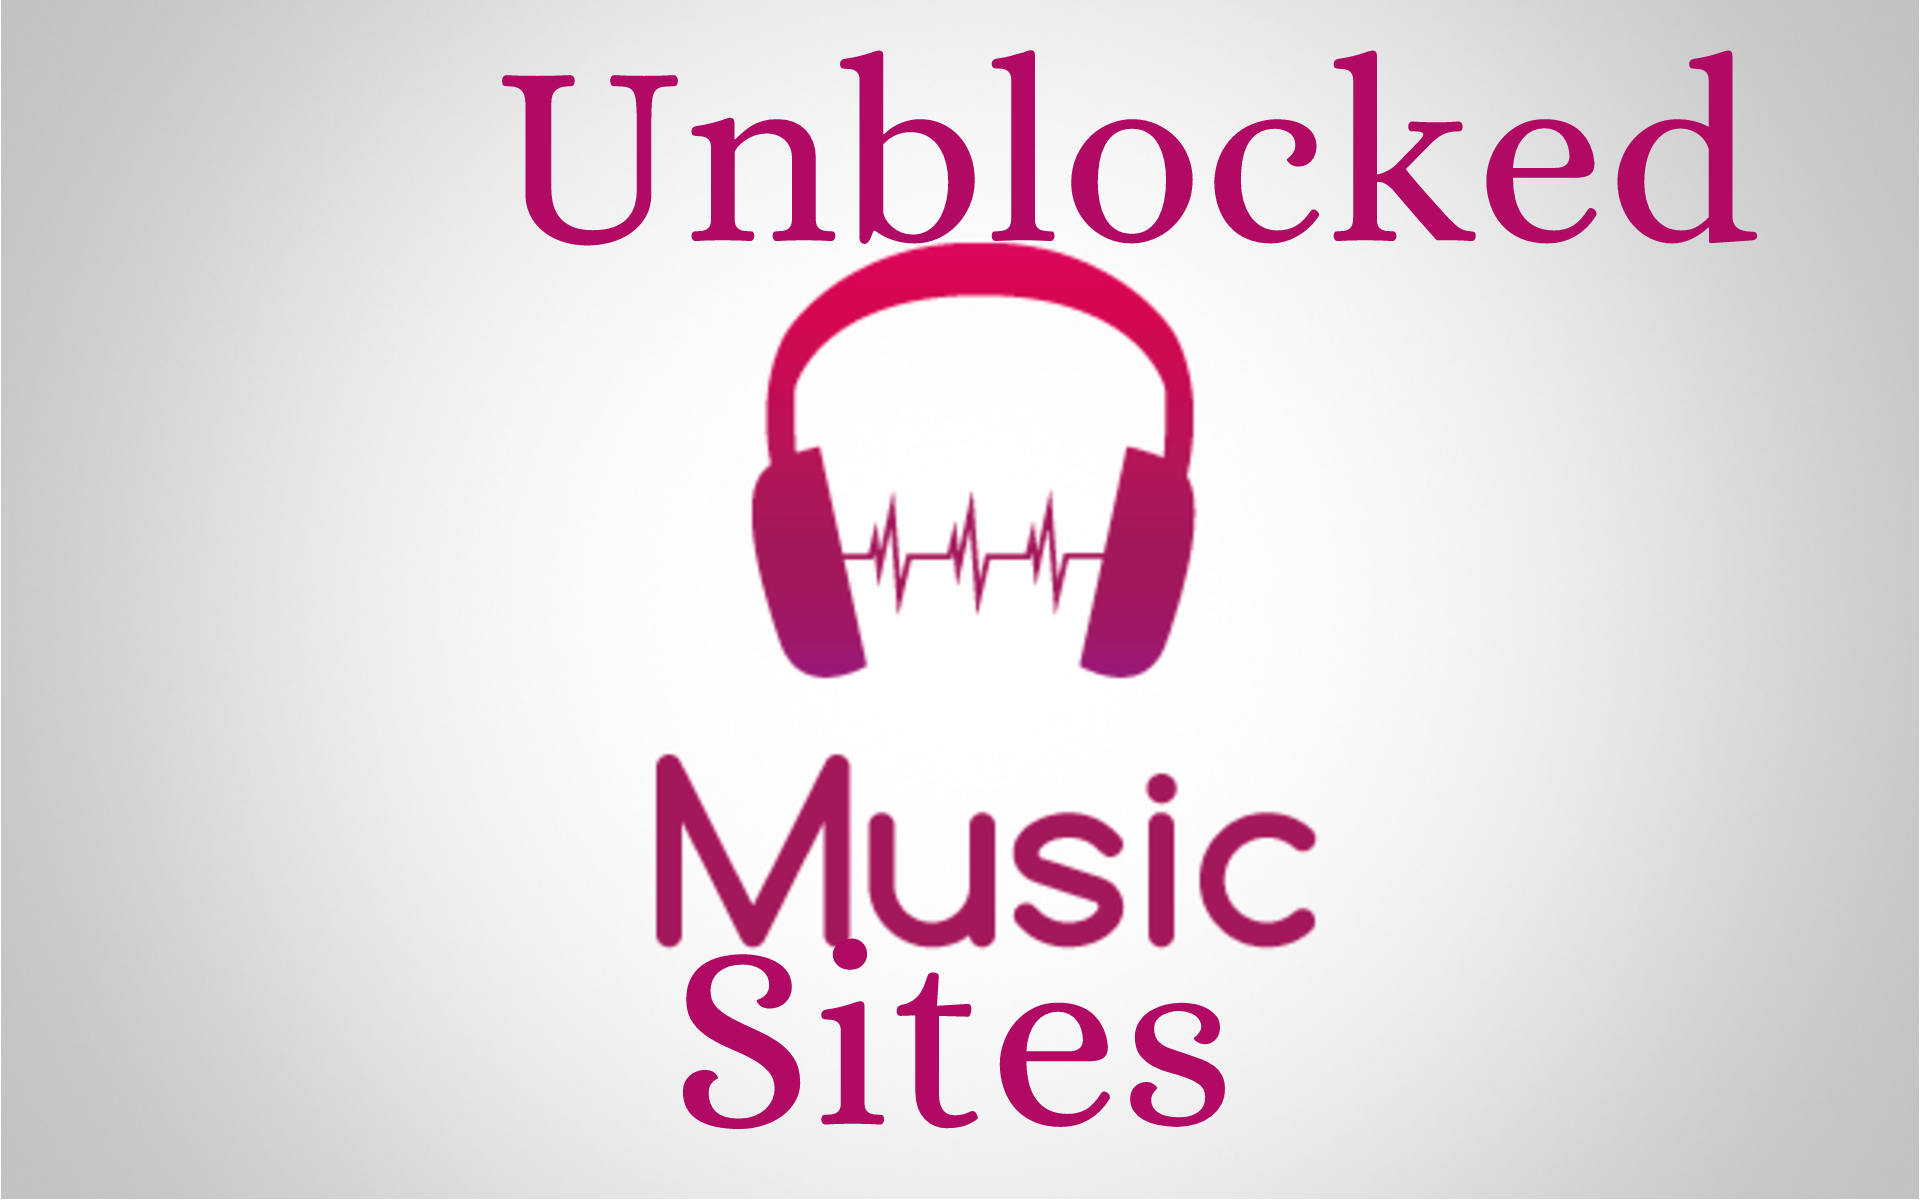 Best Unblocked Music Sites (Unblocked Music at School)